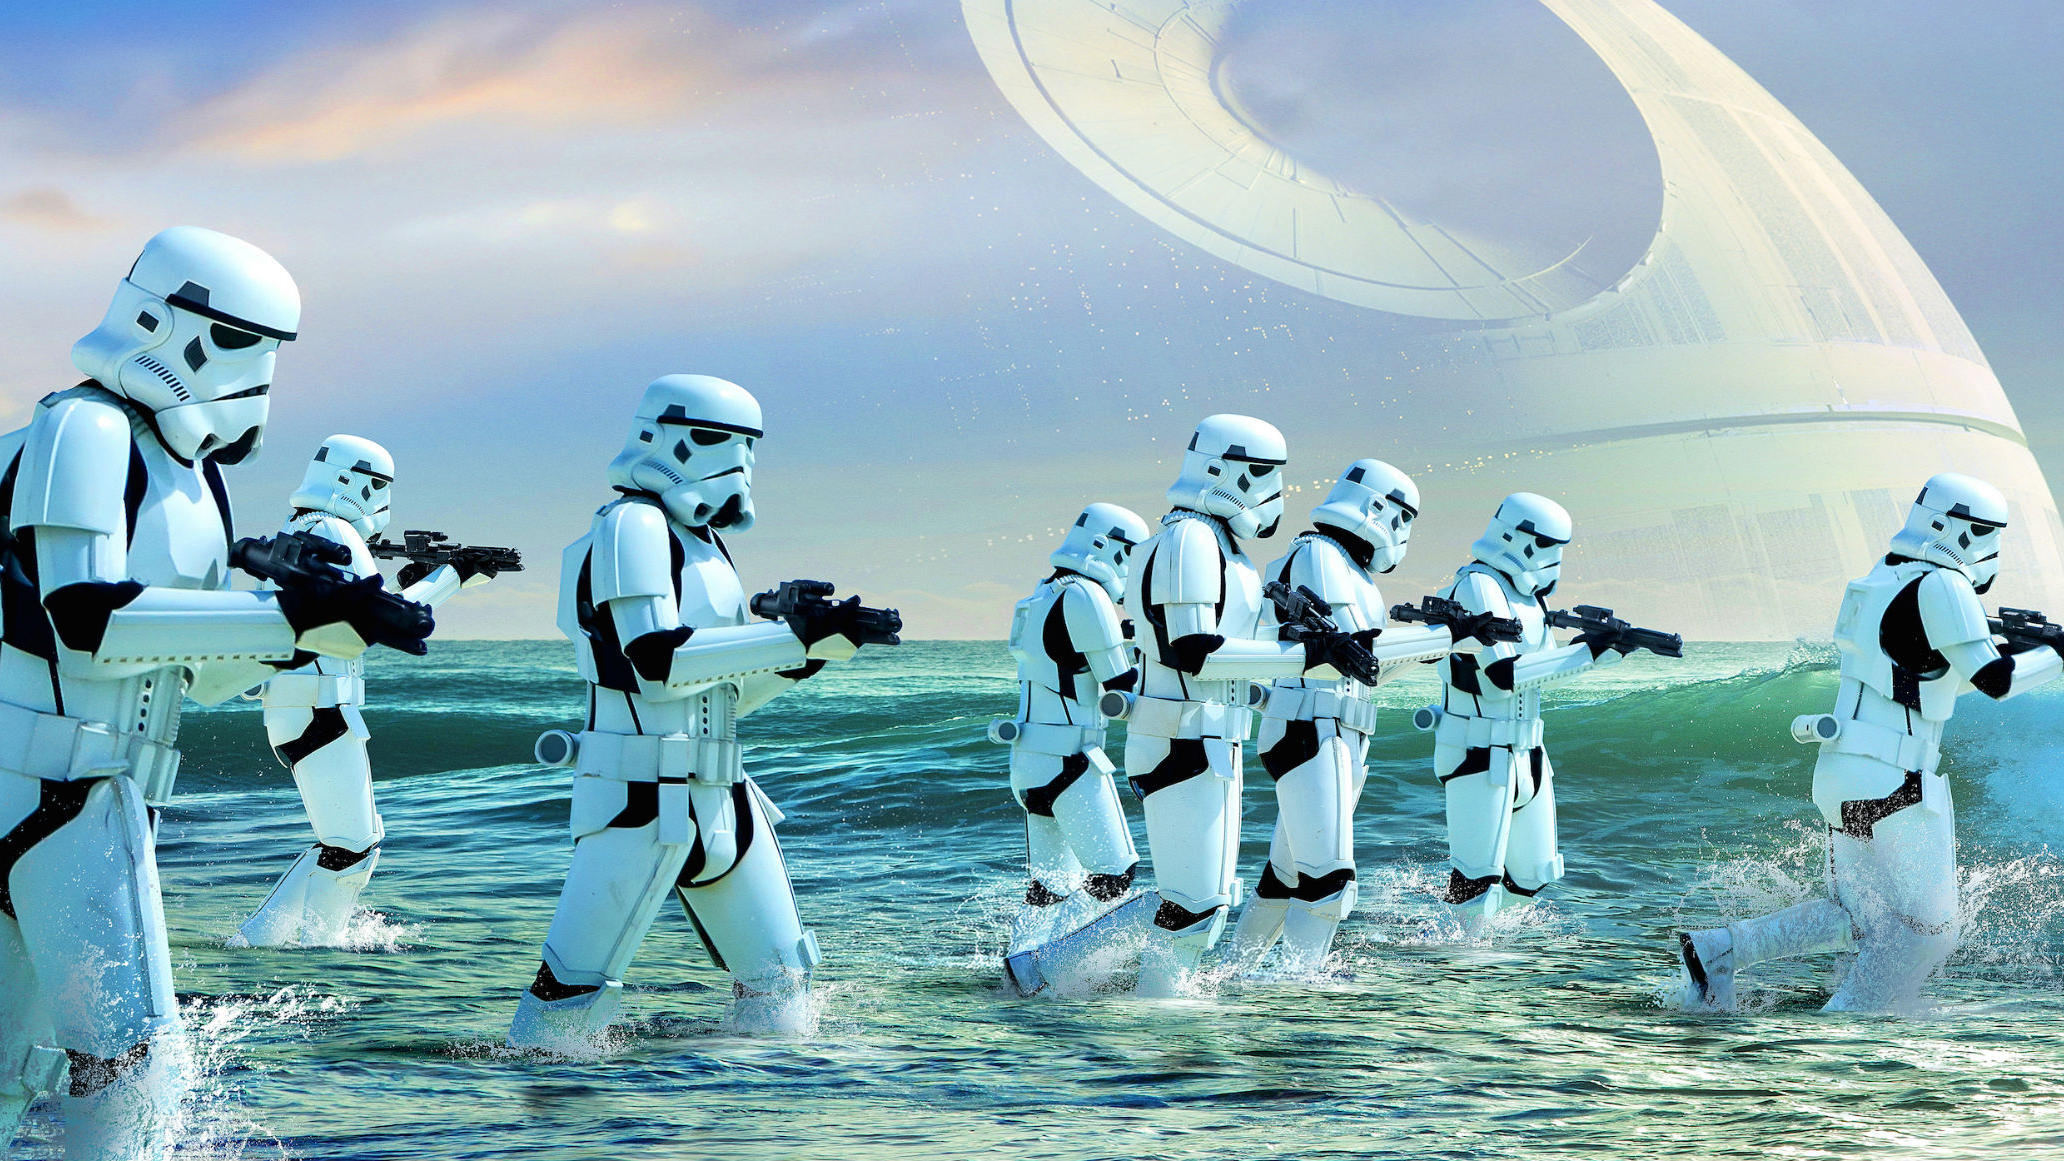 Stormtrooper Death Star 2064x1161